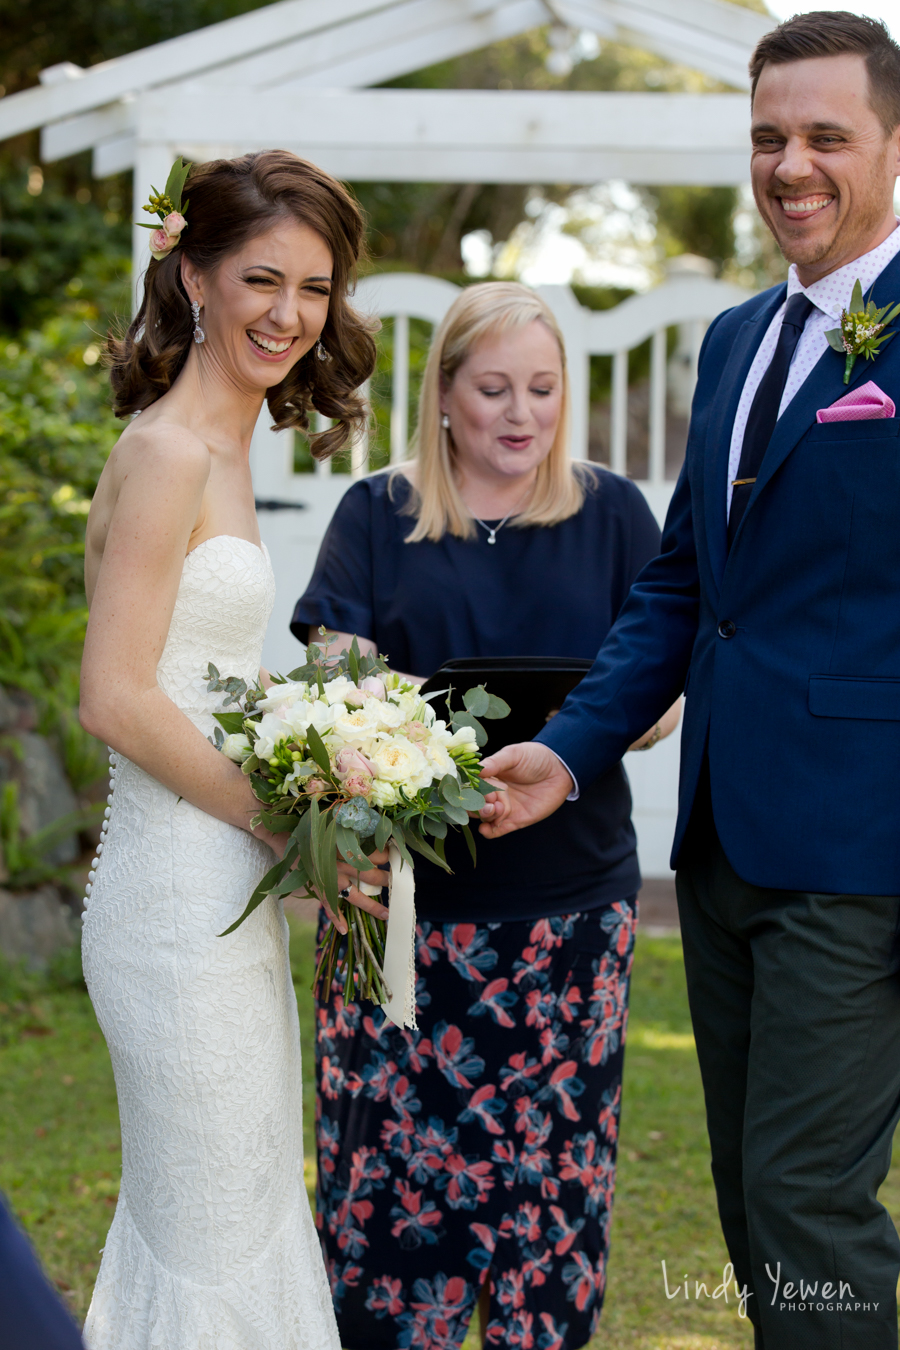 Montville-wedding-photographer-Lauren-Kirby 76.jpg